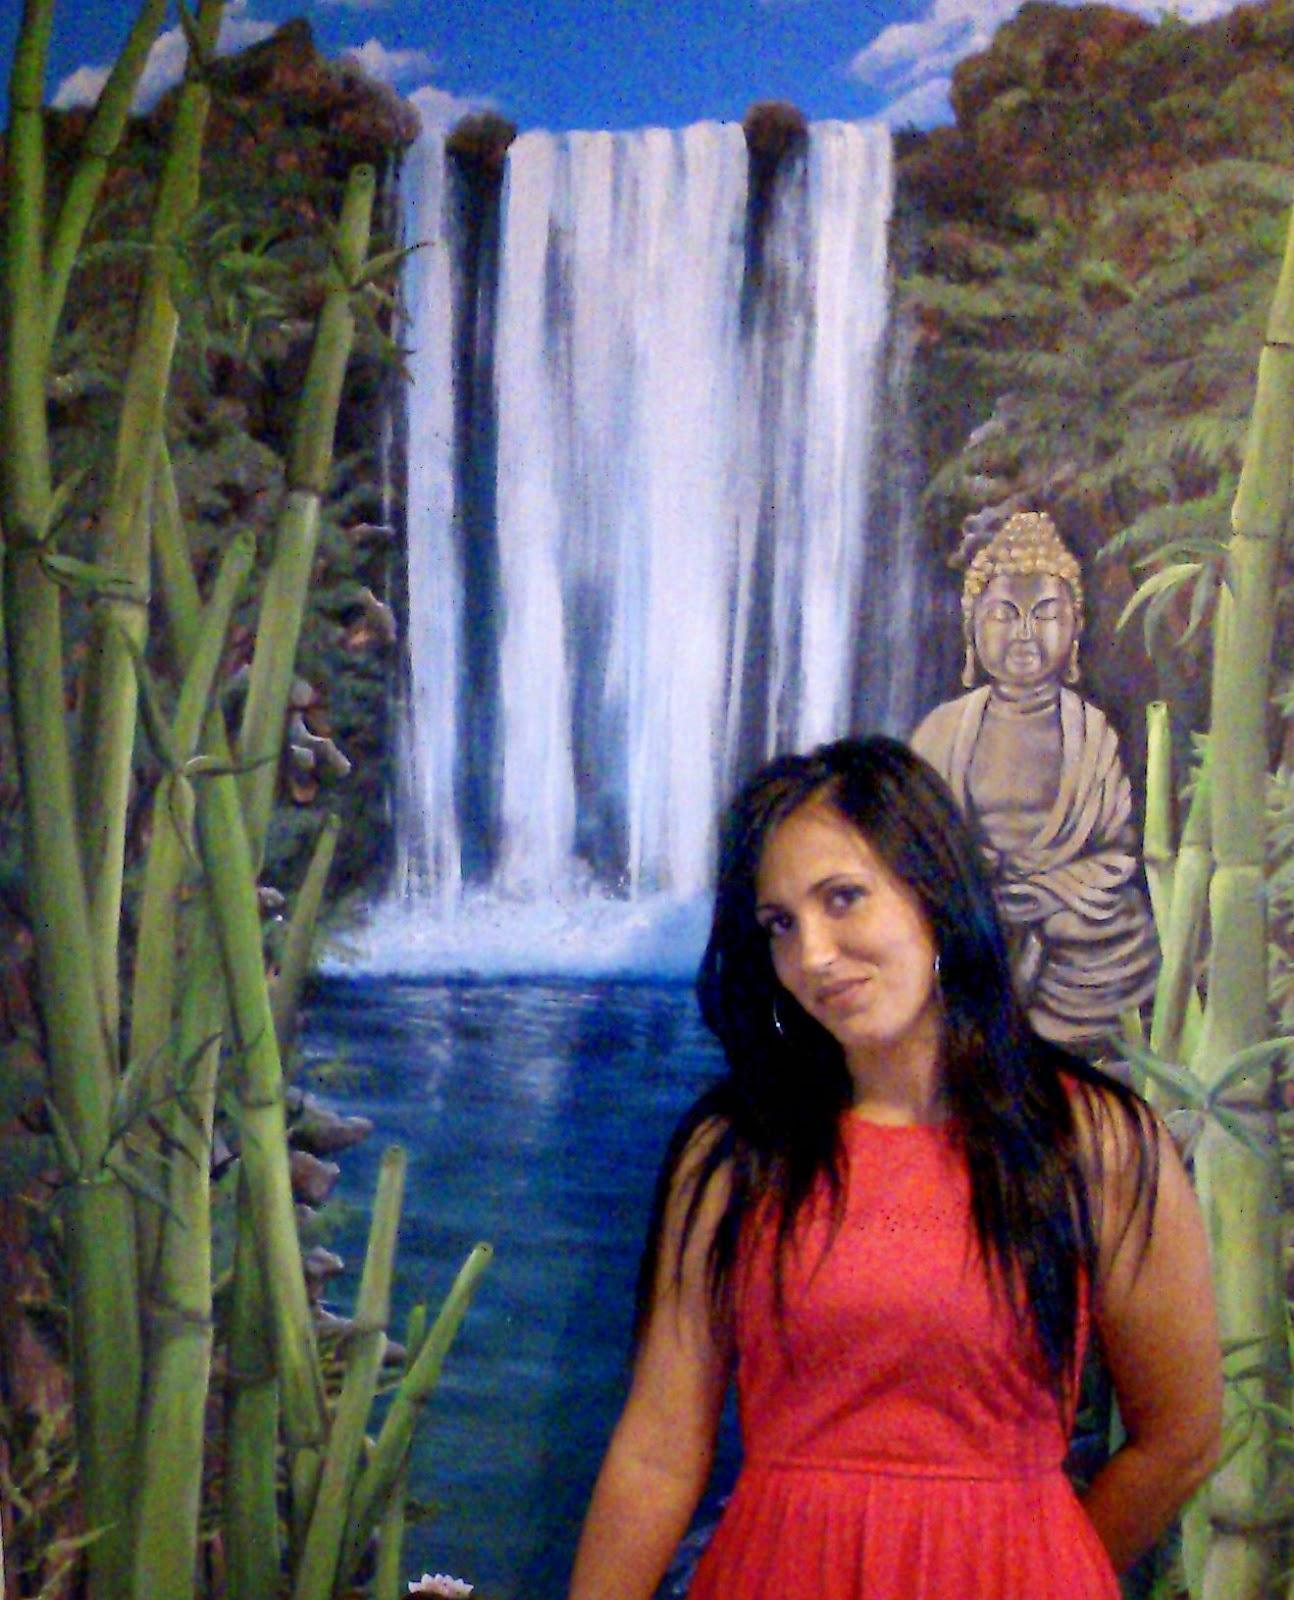 Chipi artesan a murales pintados a mano sobre paredes - Murales pintados a mano ...